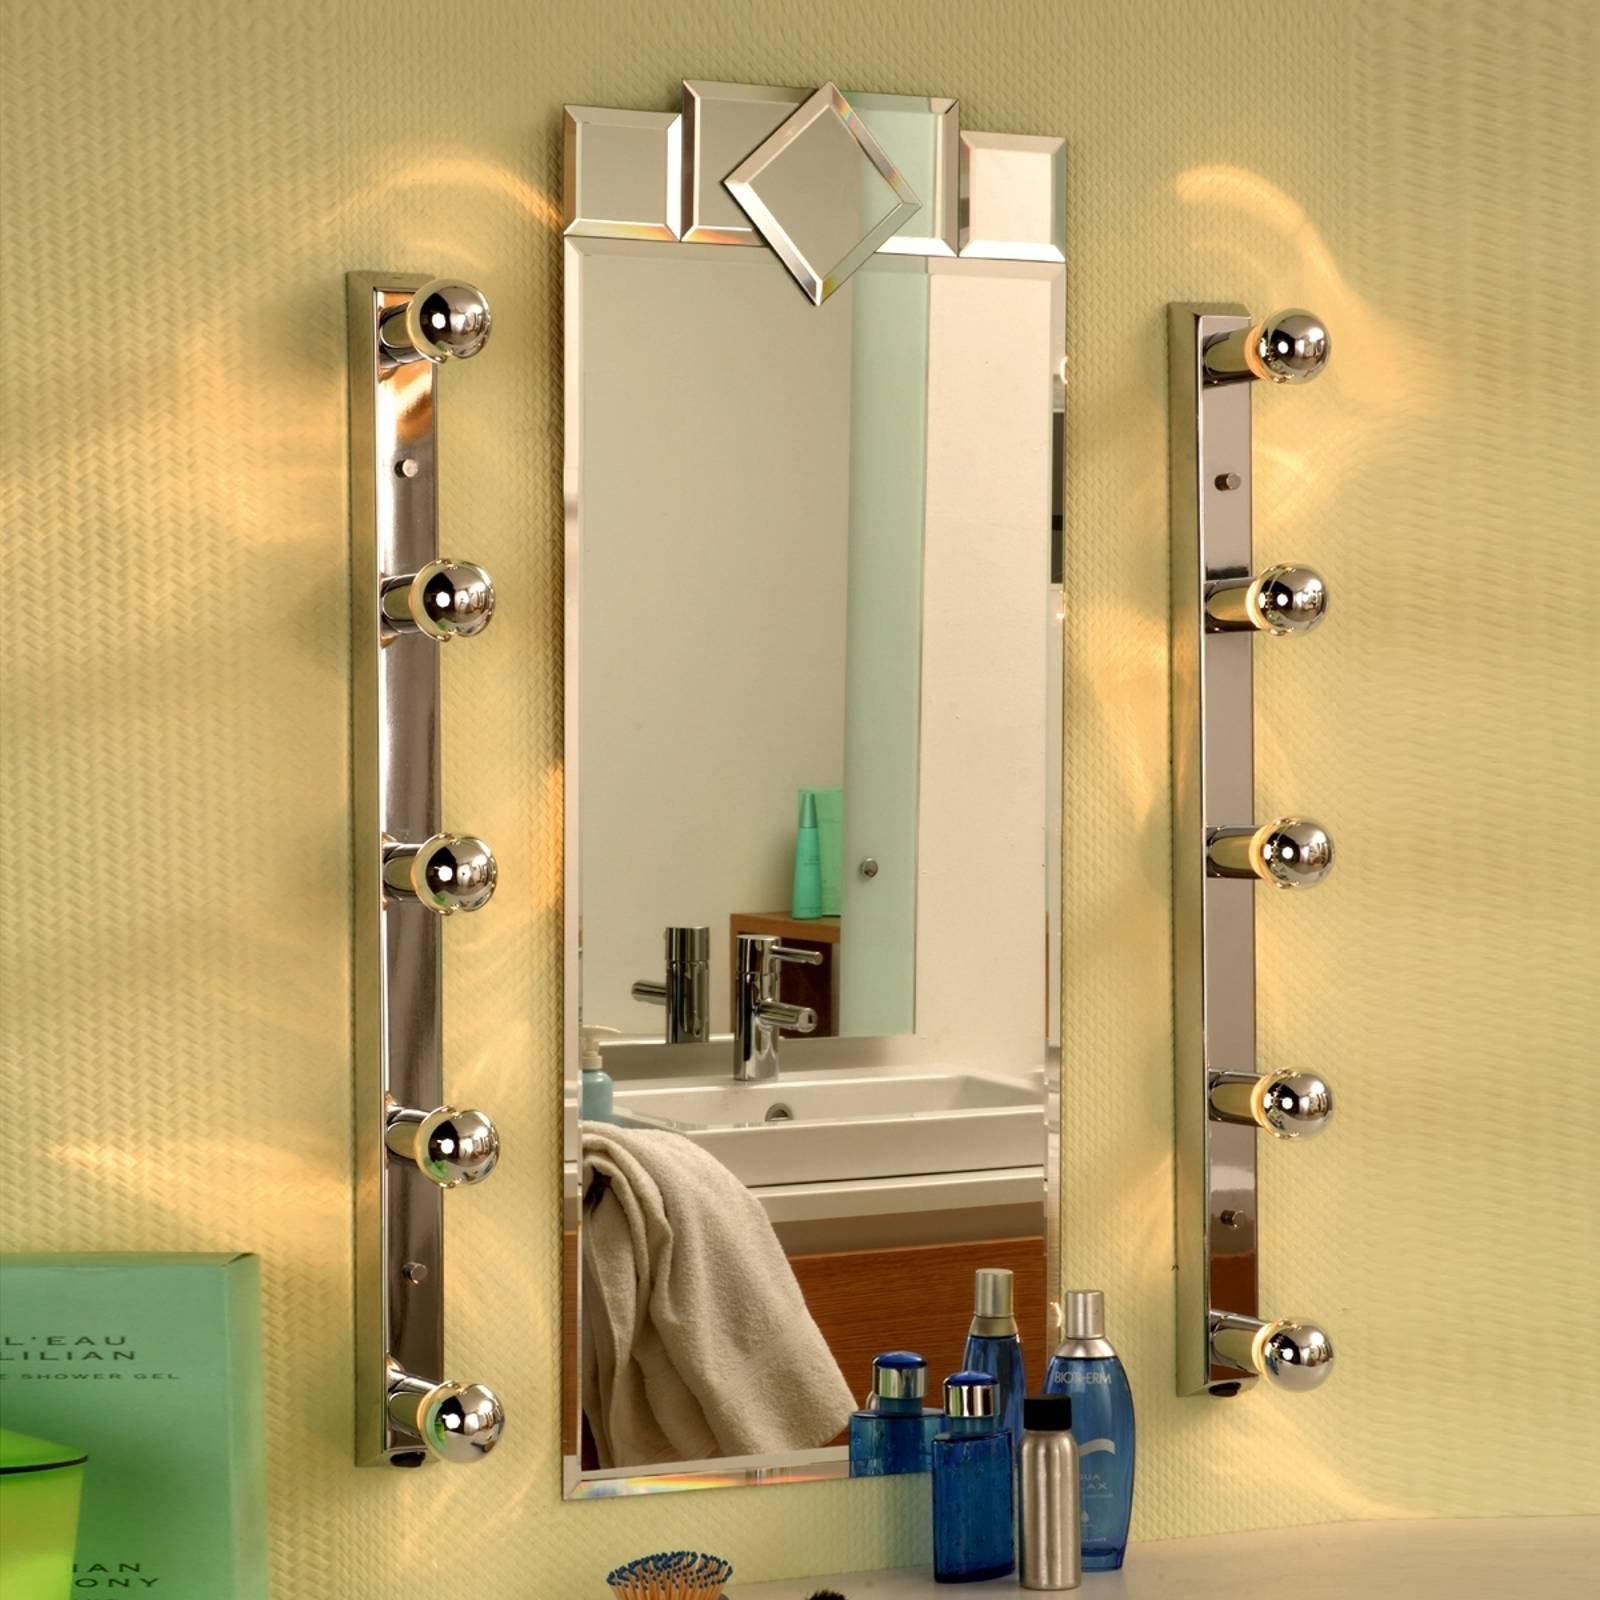 GALERIA REGULA speilbelysning med fem lys